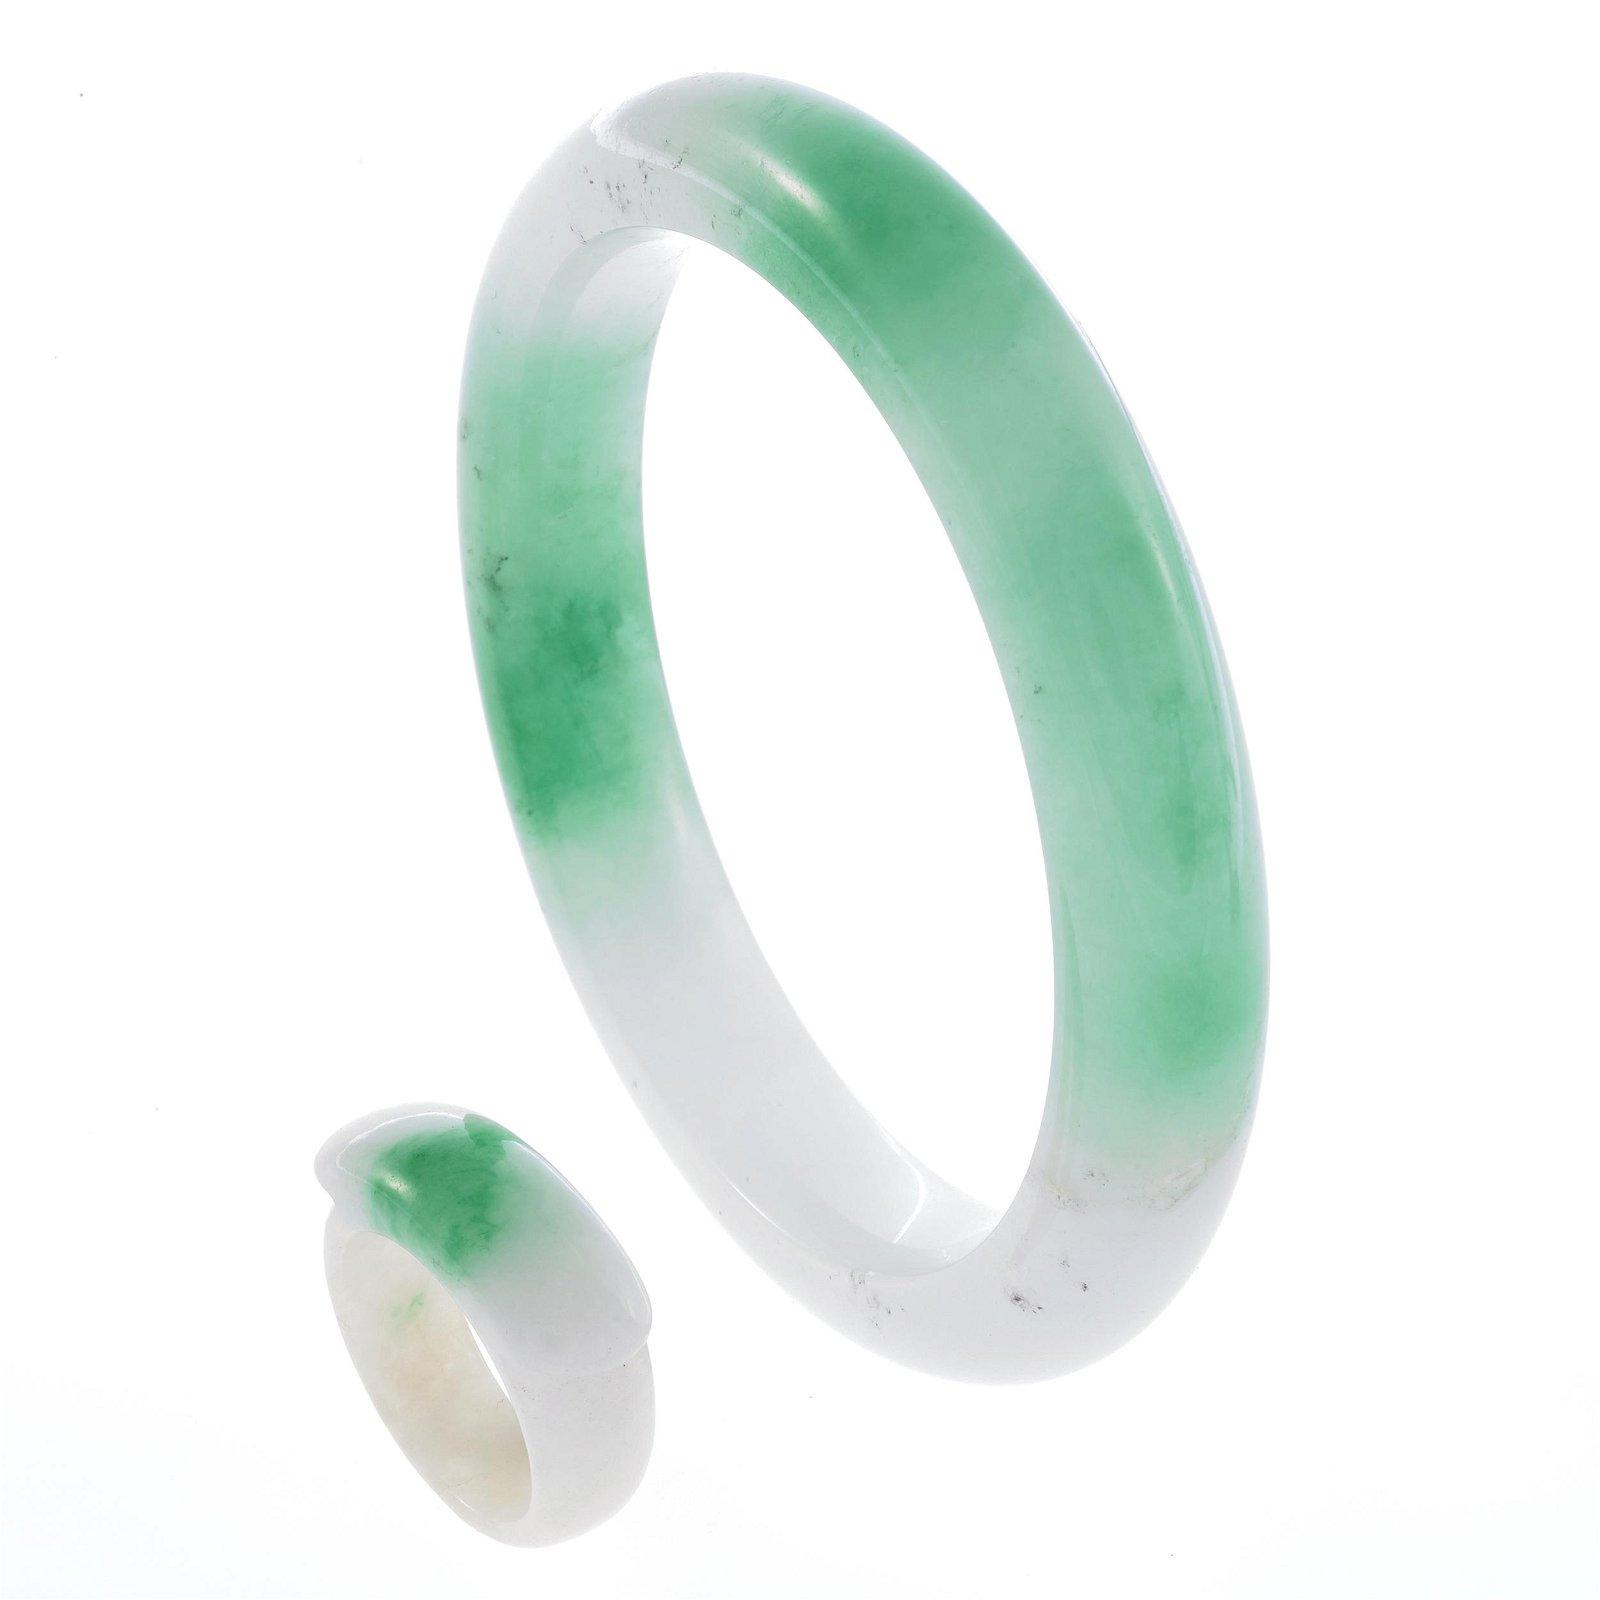 A jadeite bracelet and saddle ring